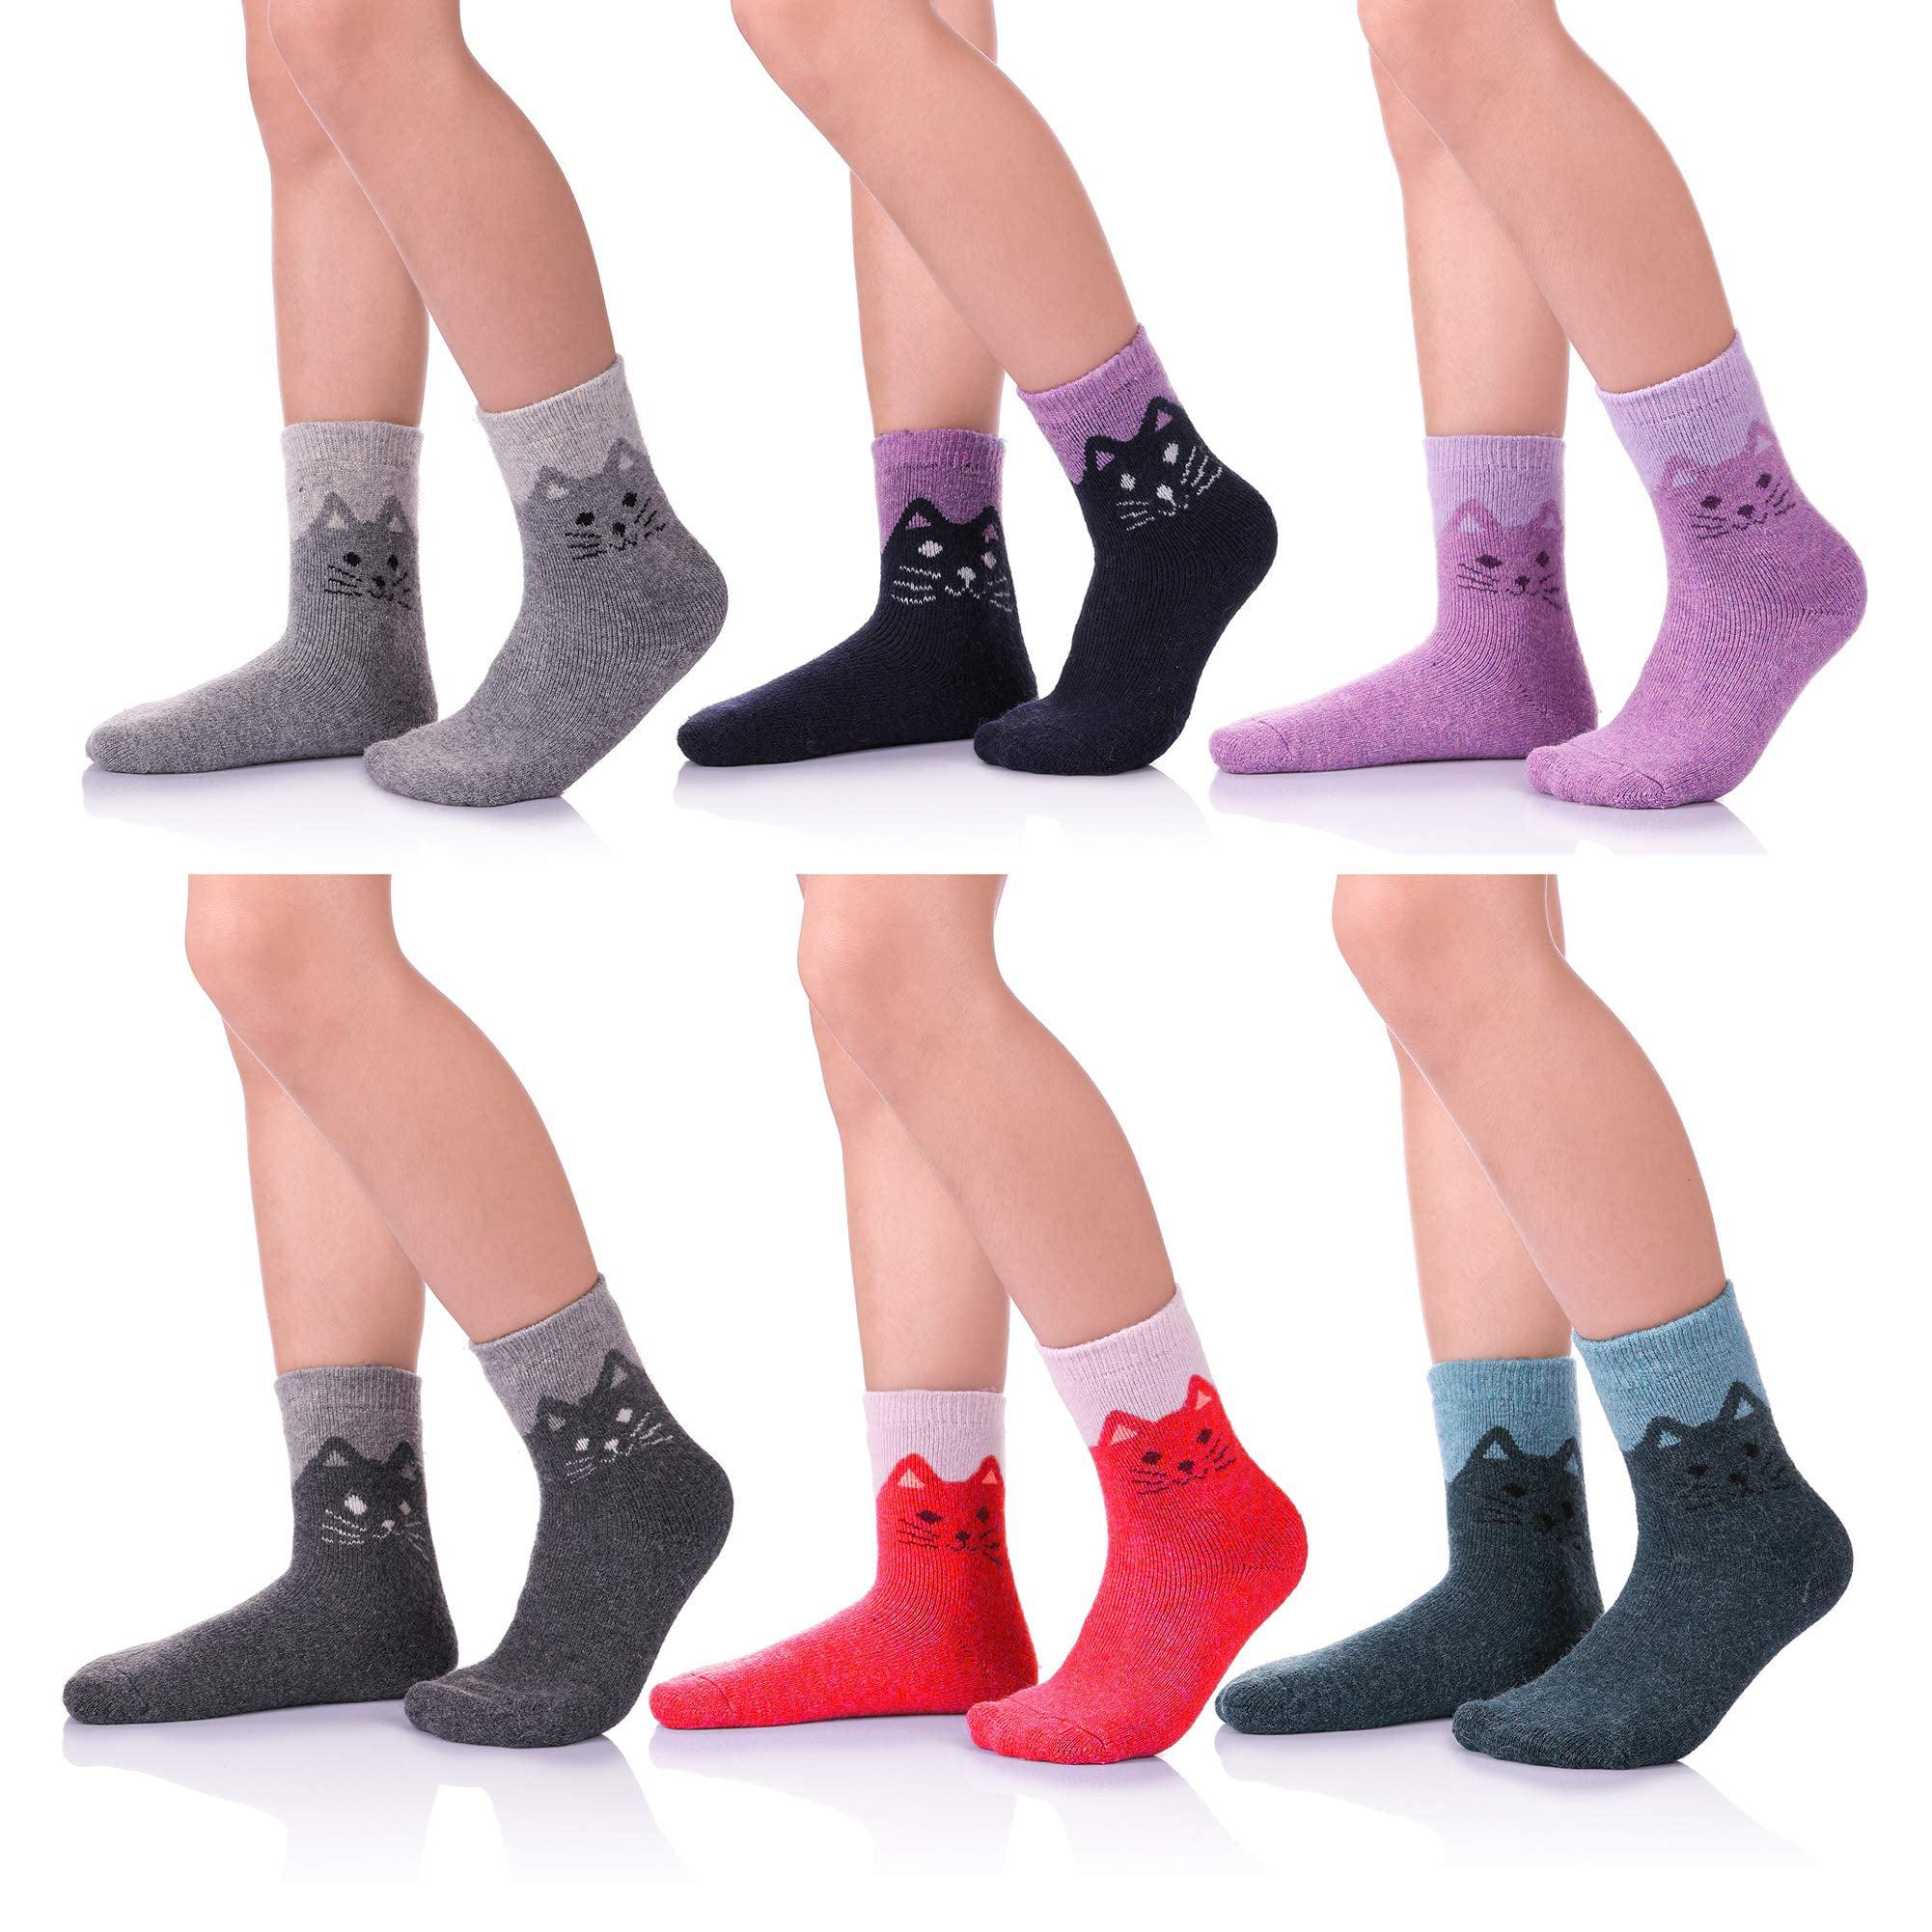 Kids Winter Socks Super Thick Sofe Wool Socks for Boys Girls Crew Socks 6 Pairs